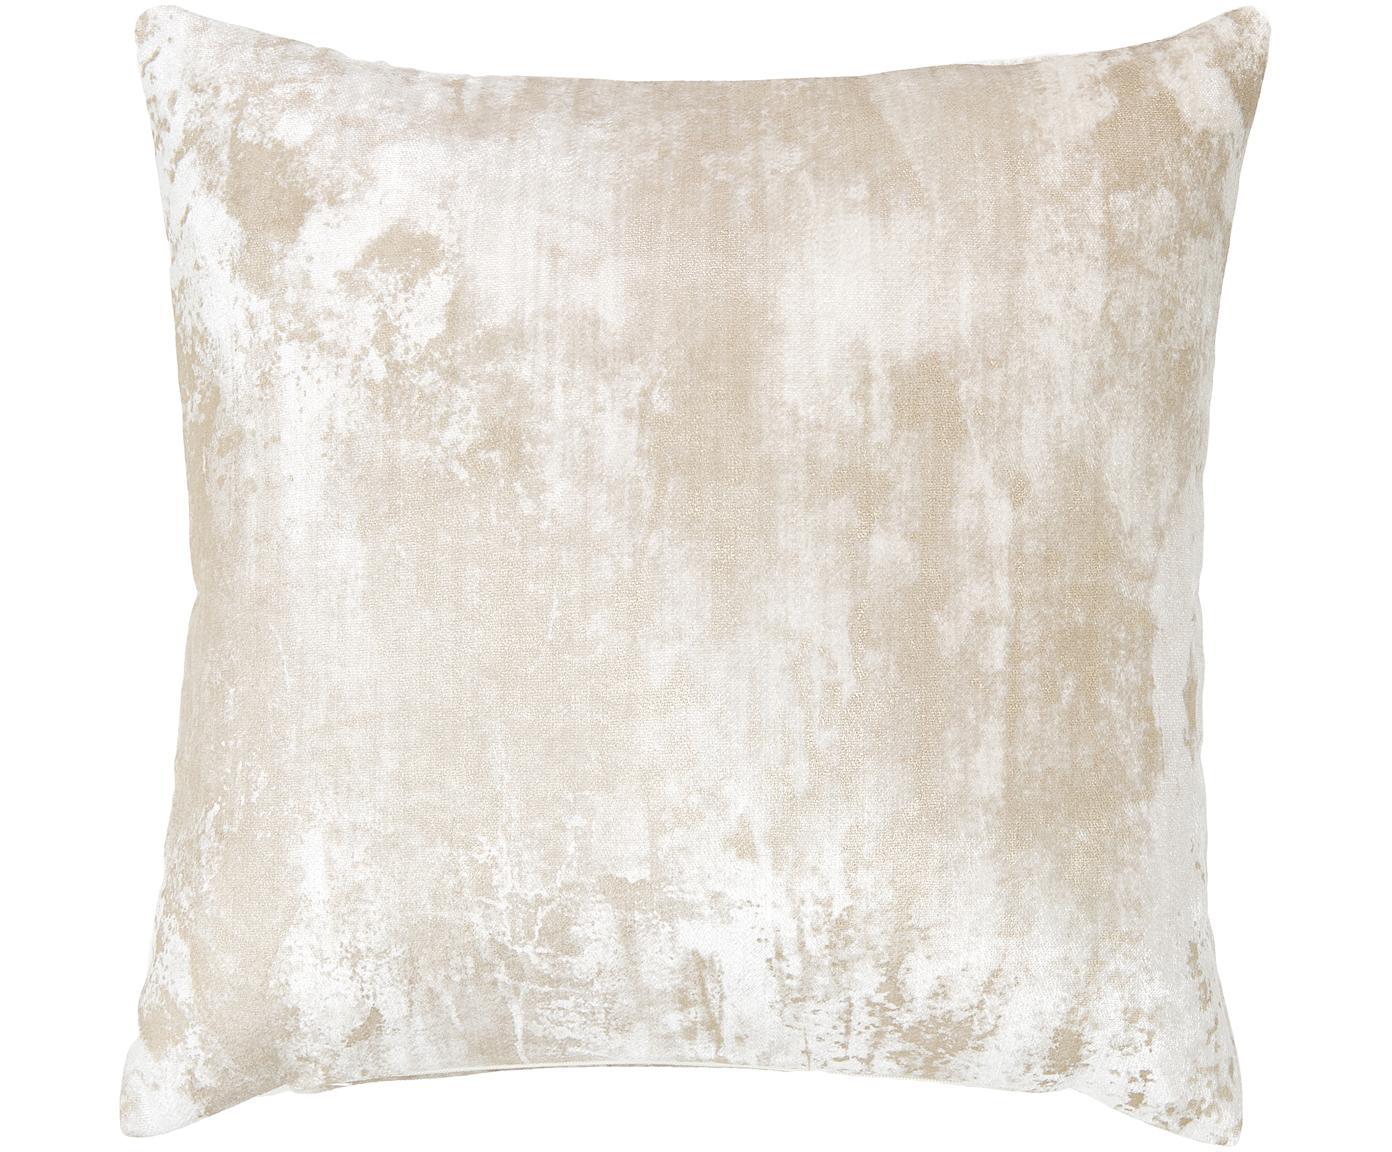 Fluwelen kussenhoes Shiny met glinsterend vintage patroon, Polyester fluweel, Crèmekleurig, 40 x 40 cm